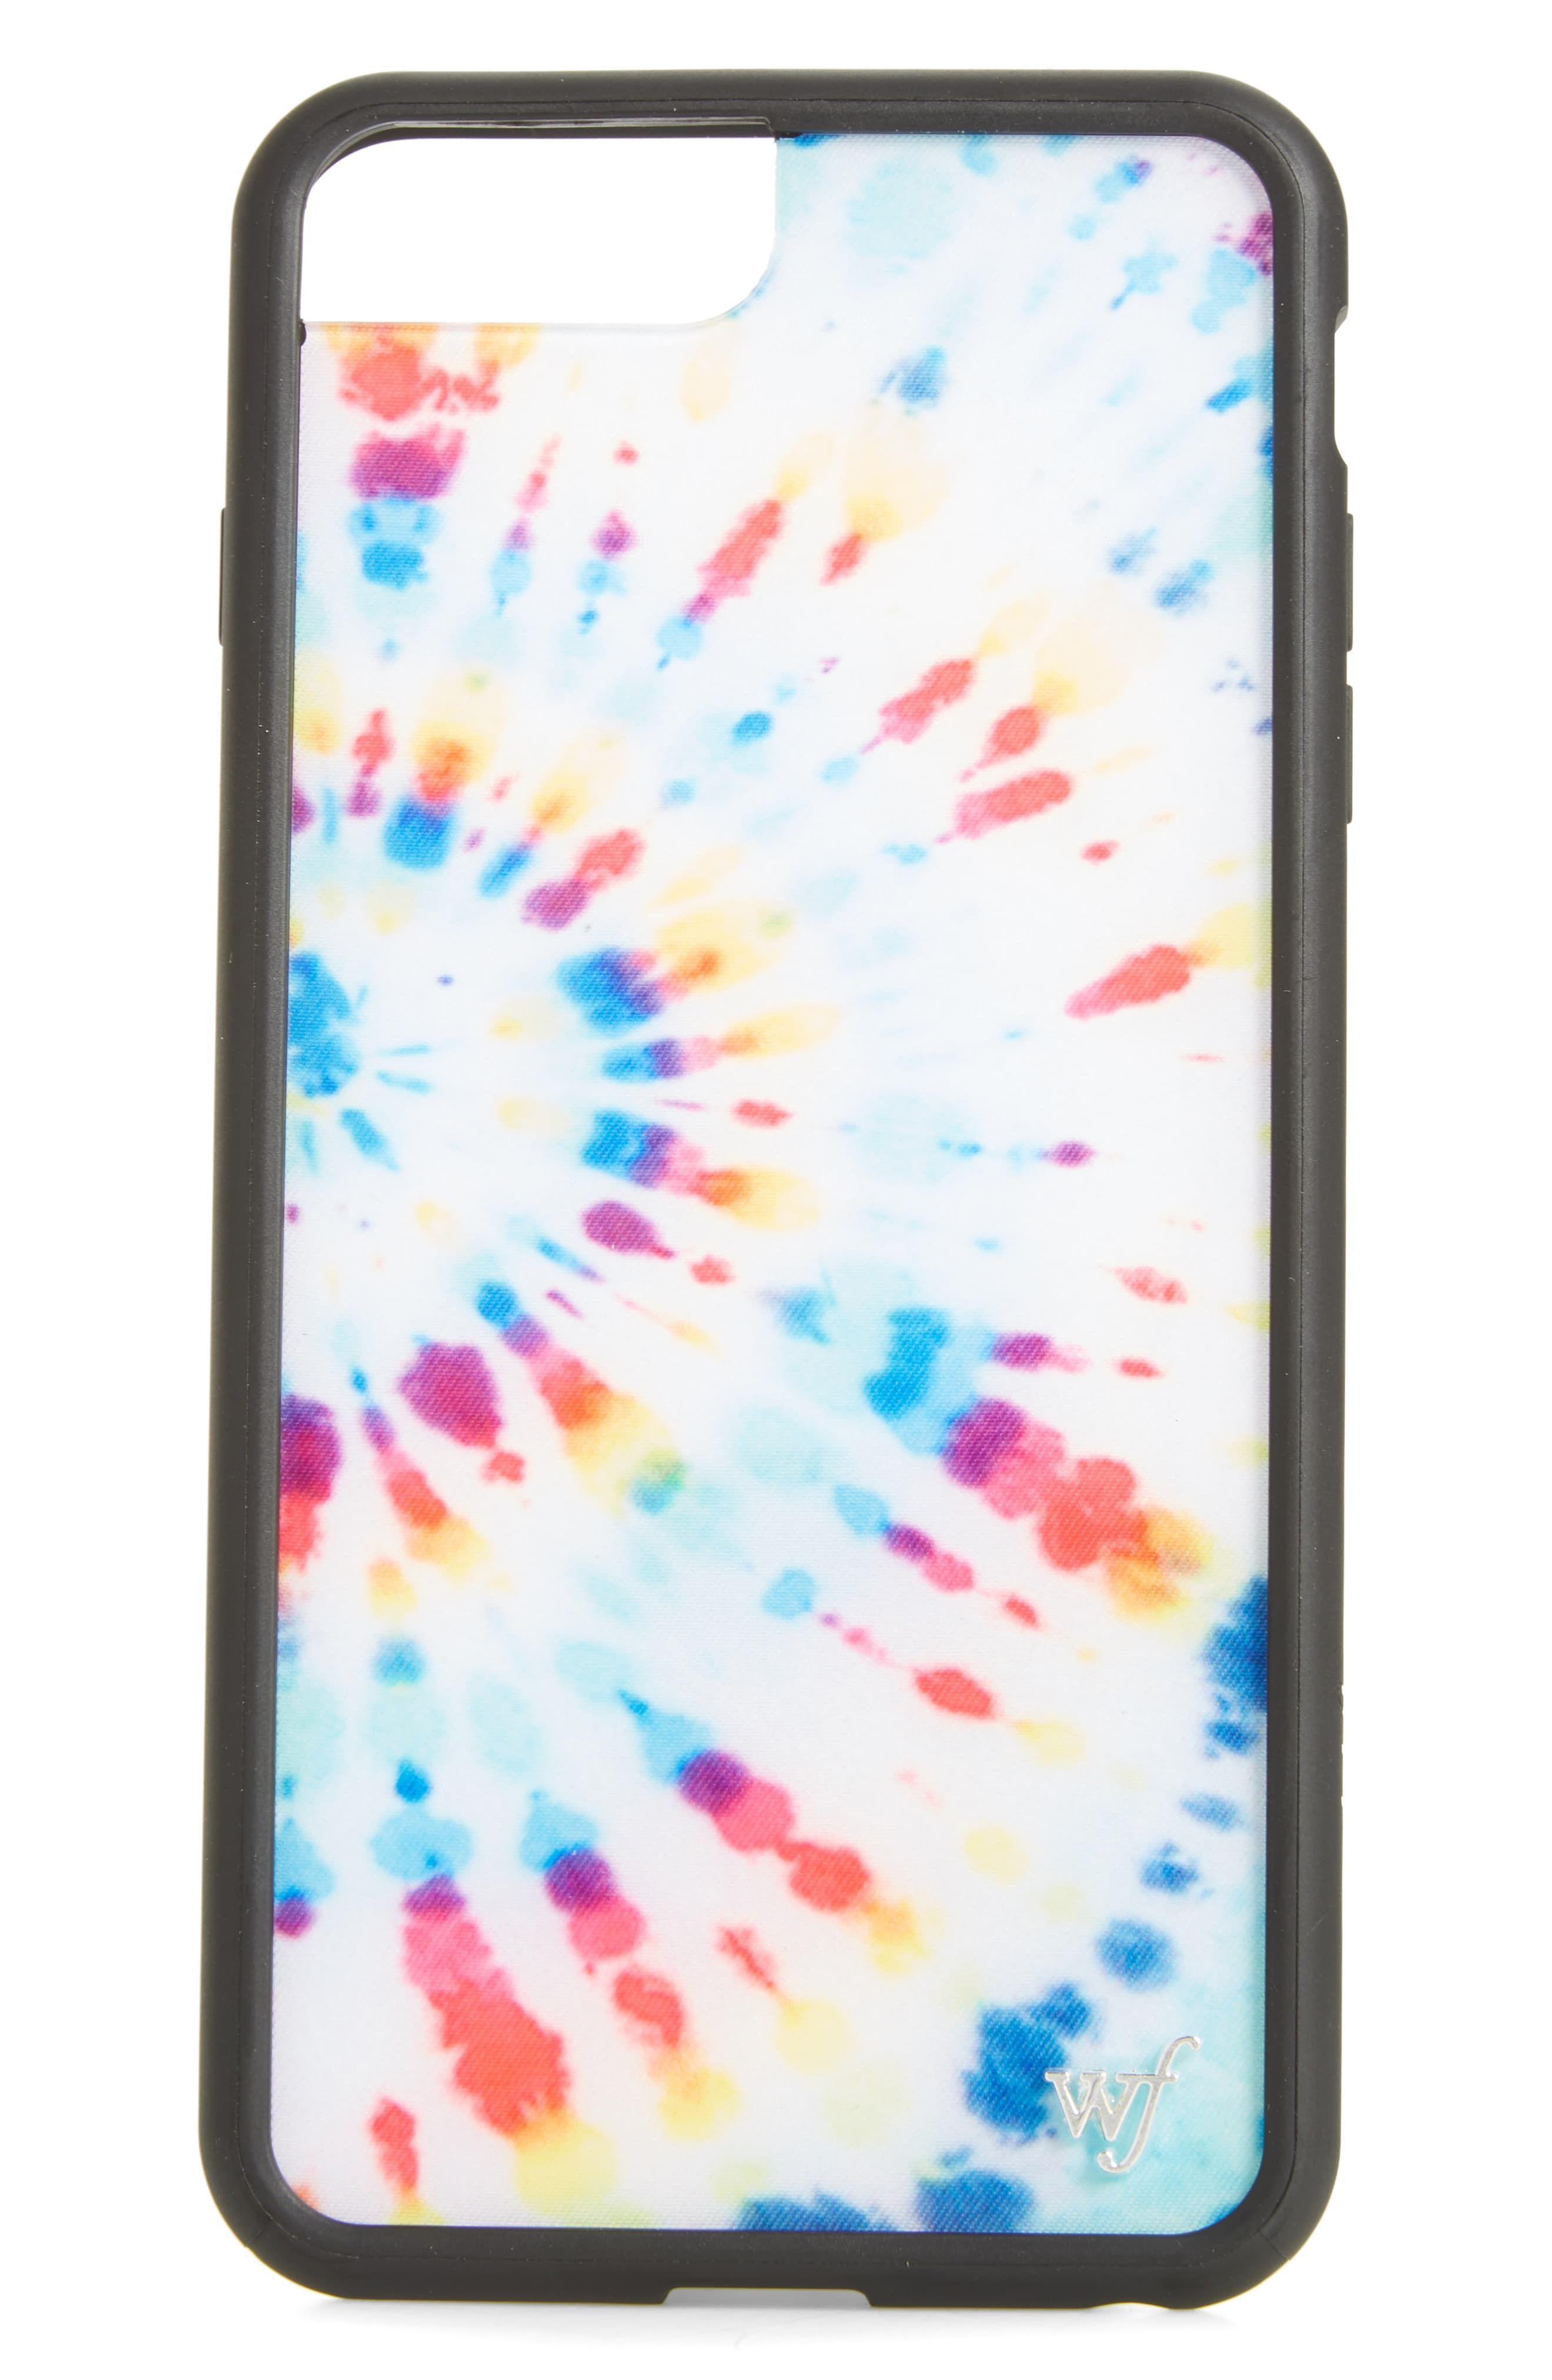 Tie Dye Tye dye wallpaper, Iphone wallpaper, Pattern